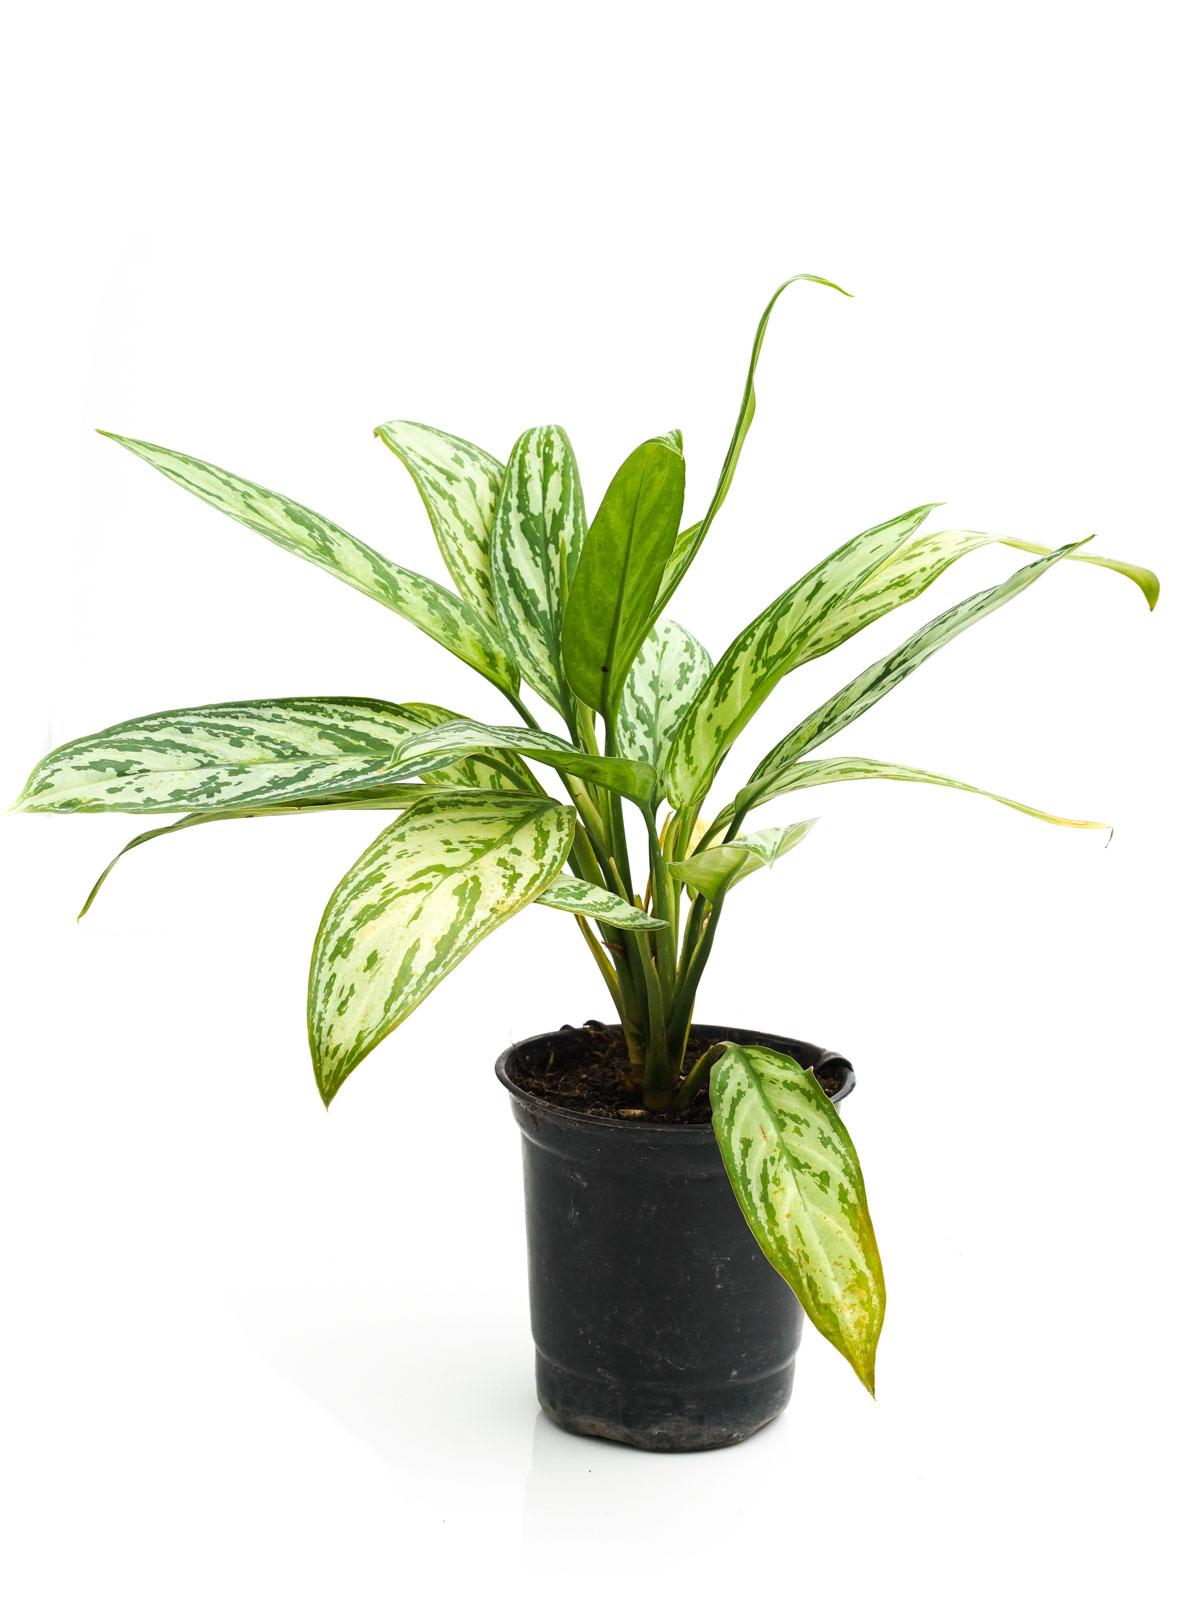 Aglaonema Silver Queen 'Indoor Plants'